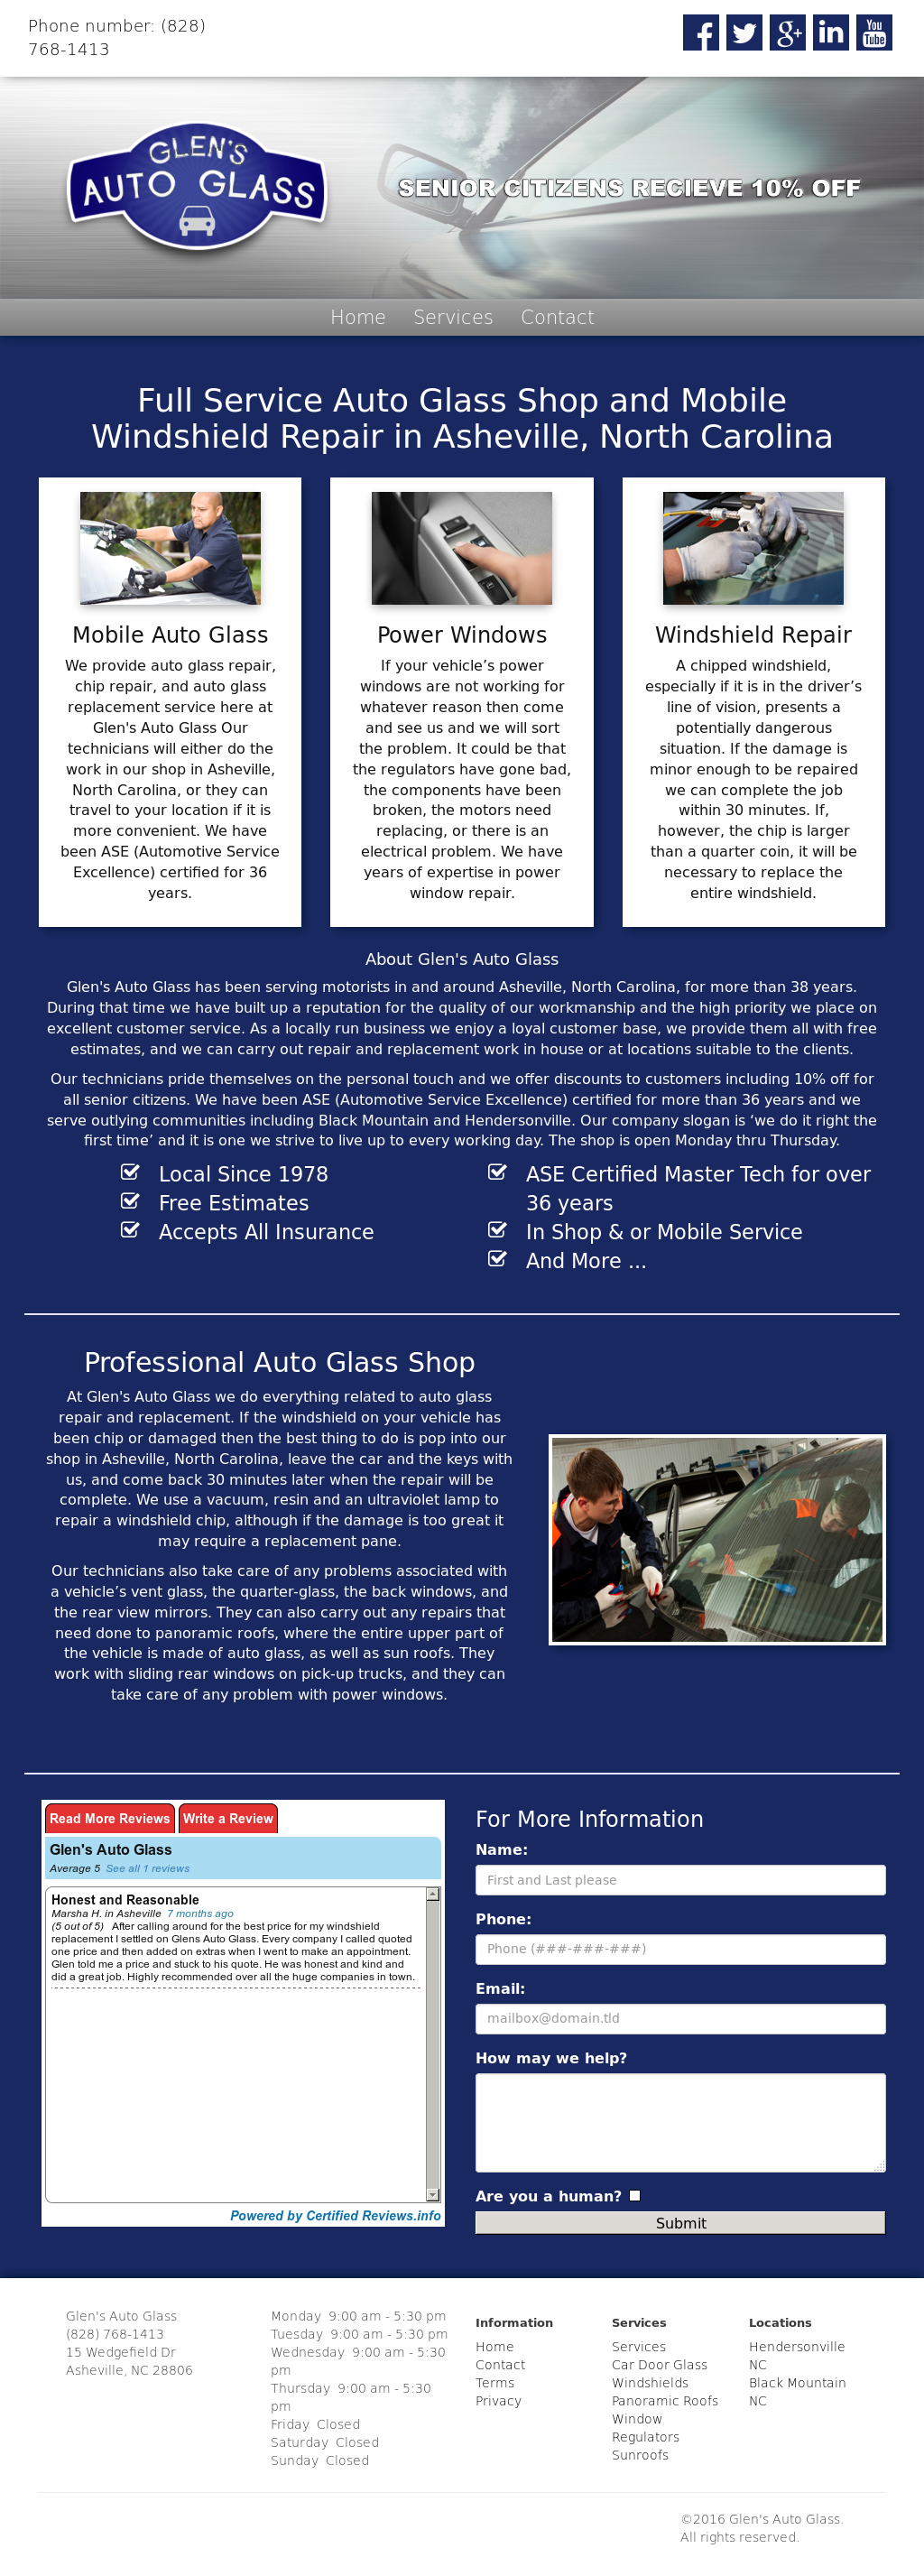 Glen's Auto Glass Competitors, Revenue and Employees - Owler Company